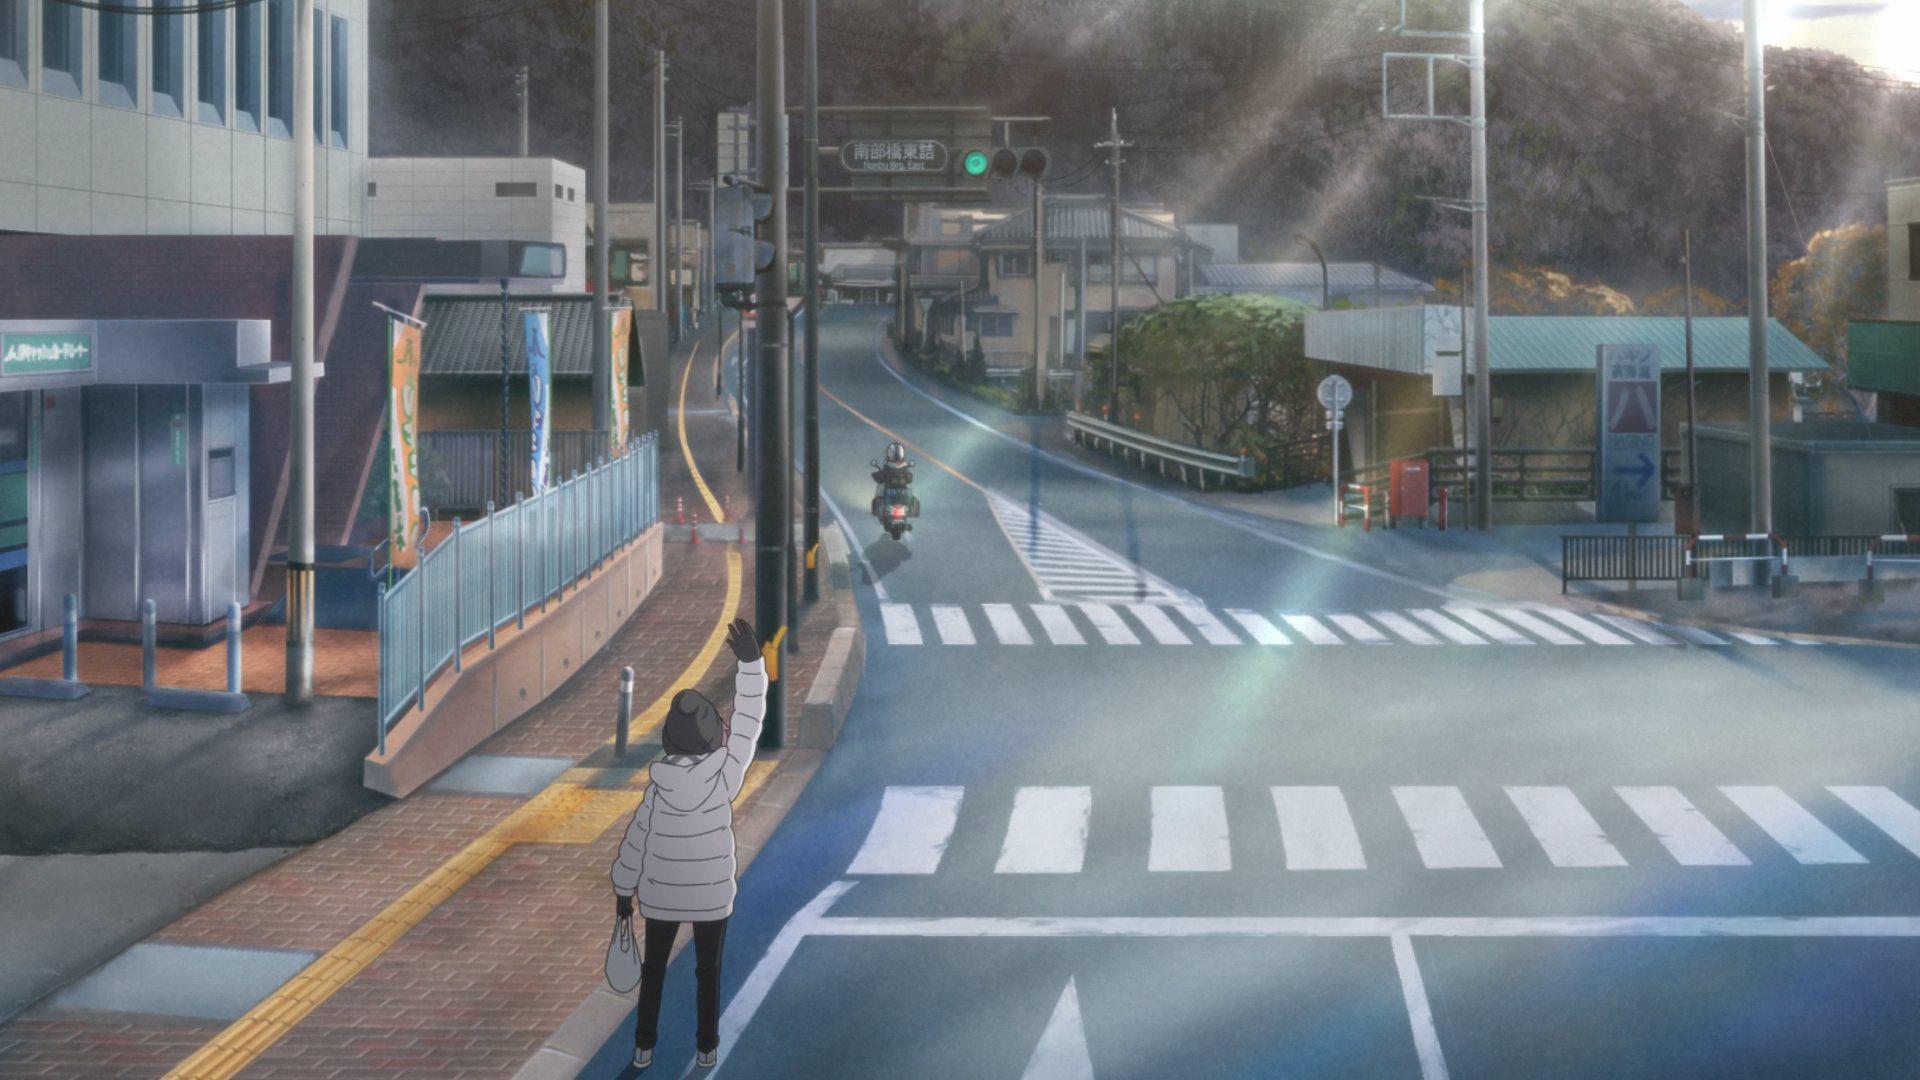 Yuru Camp - recenzja anime zima 2021 - rascal.pl